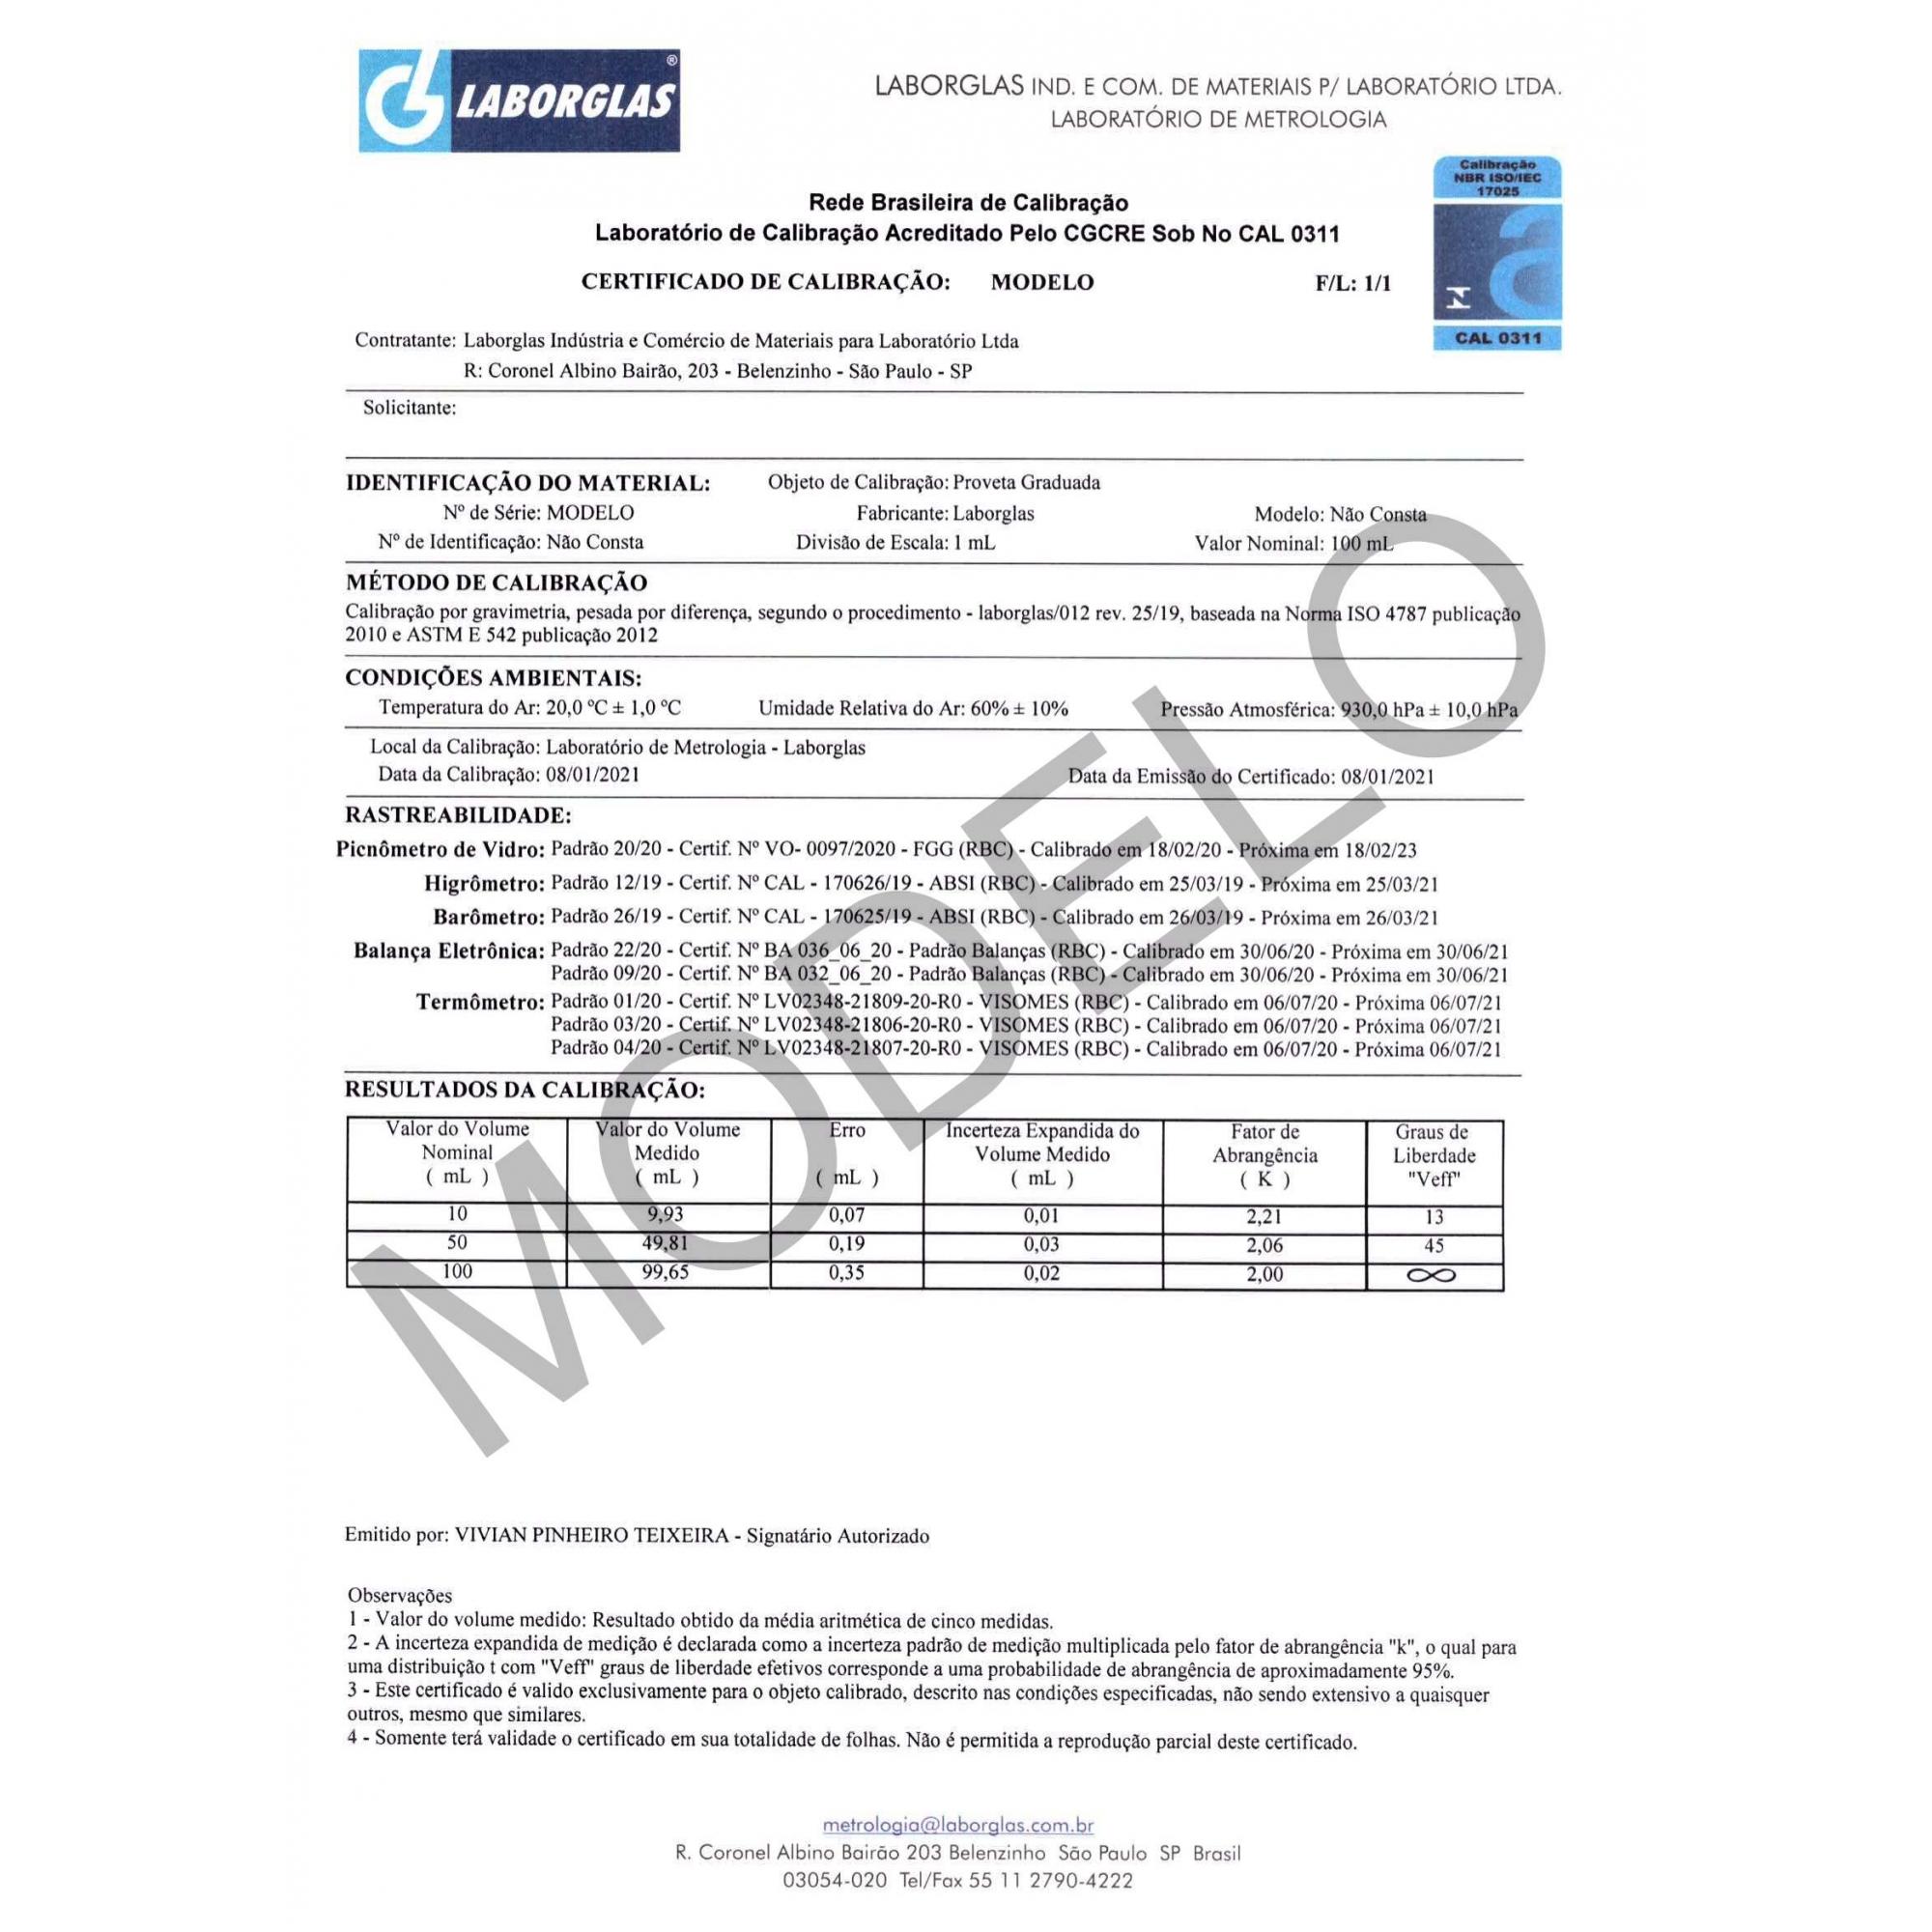 PROVETA GRADUADA BASE HEXAGONAL DE POLIPROPILENO 100 ML CLASSE A CERTIFICADO RBC - Laborglas - Cód. 9138724-R